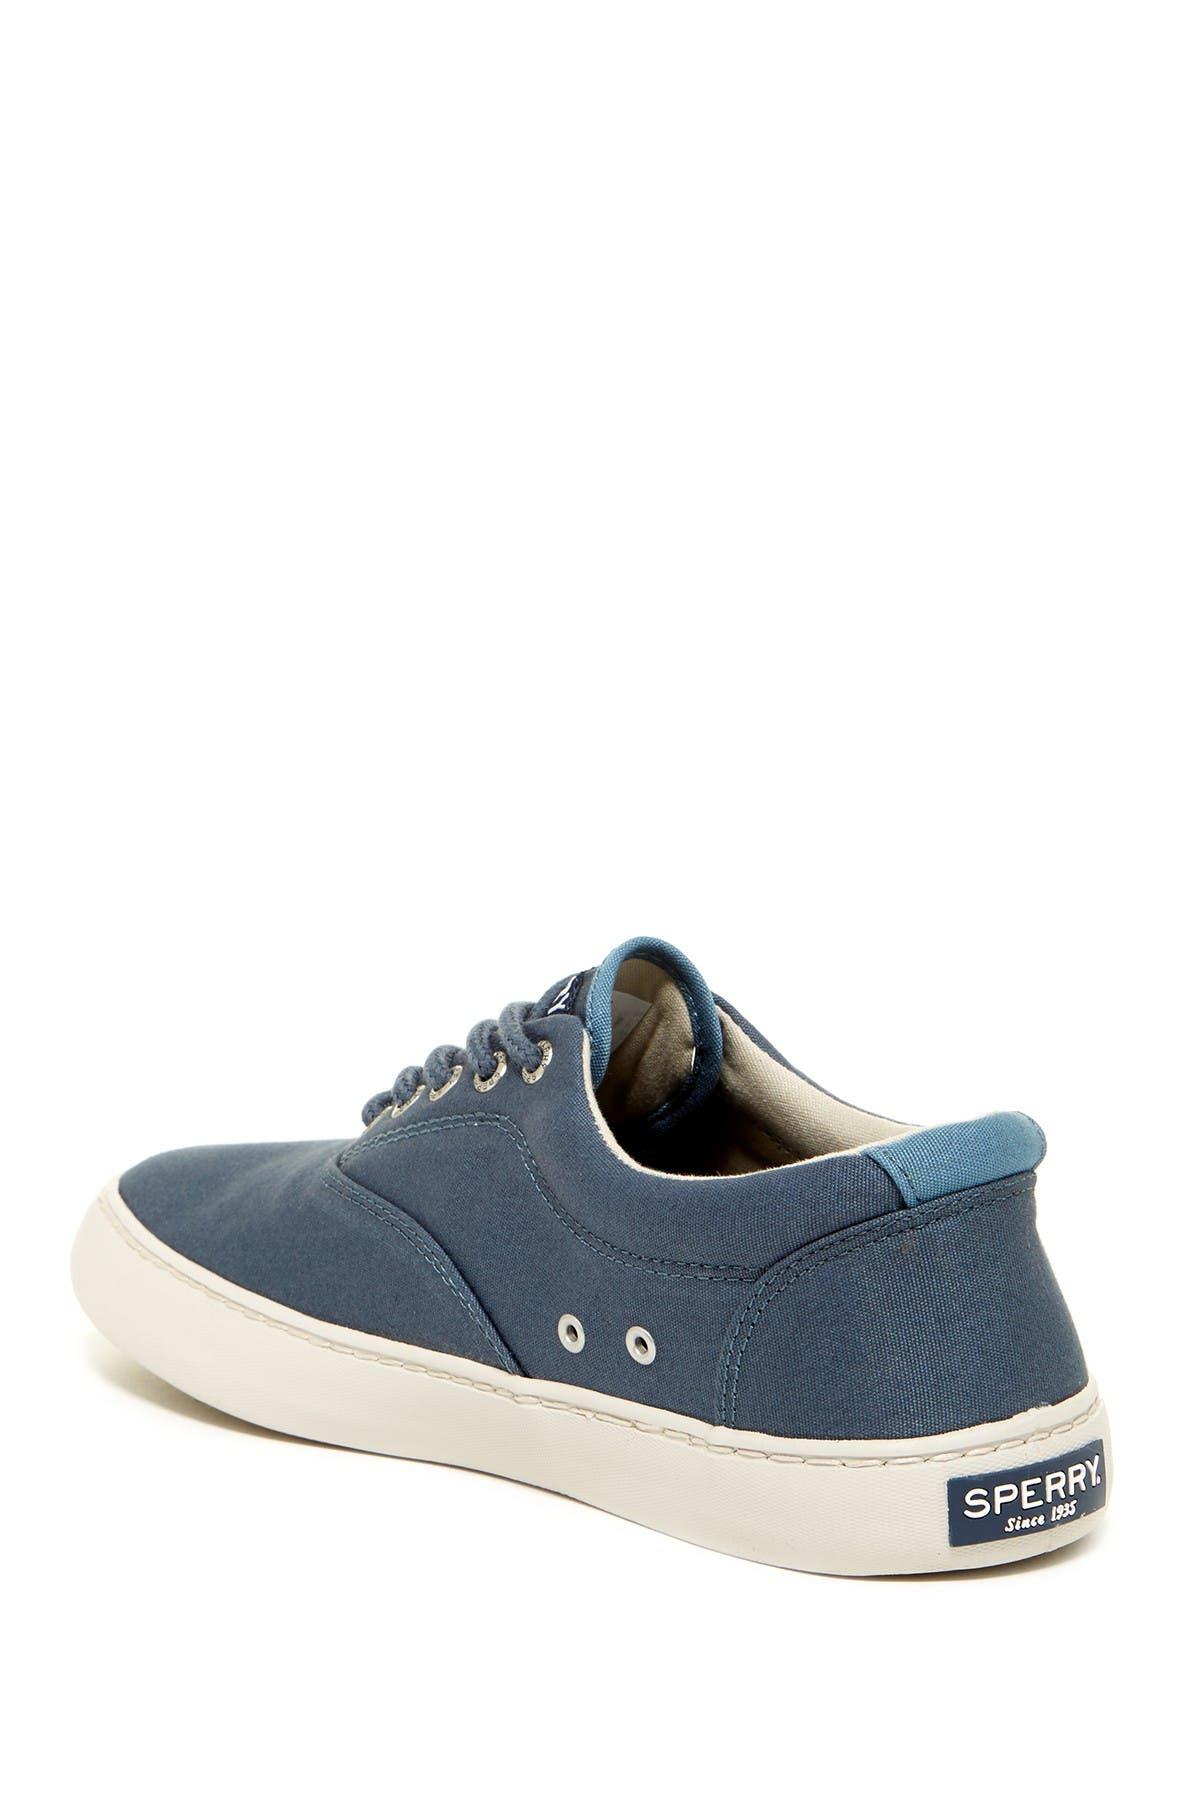 Sperry   Cutter CVO Sneaker   Nordstrom